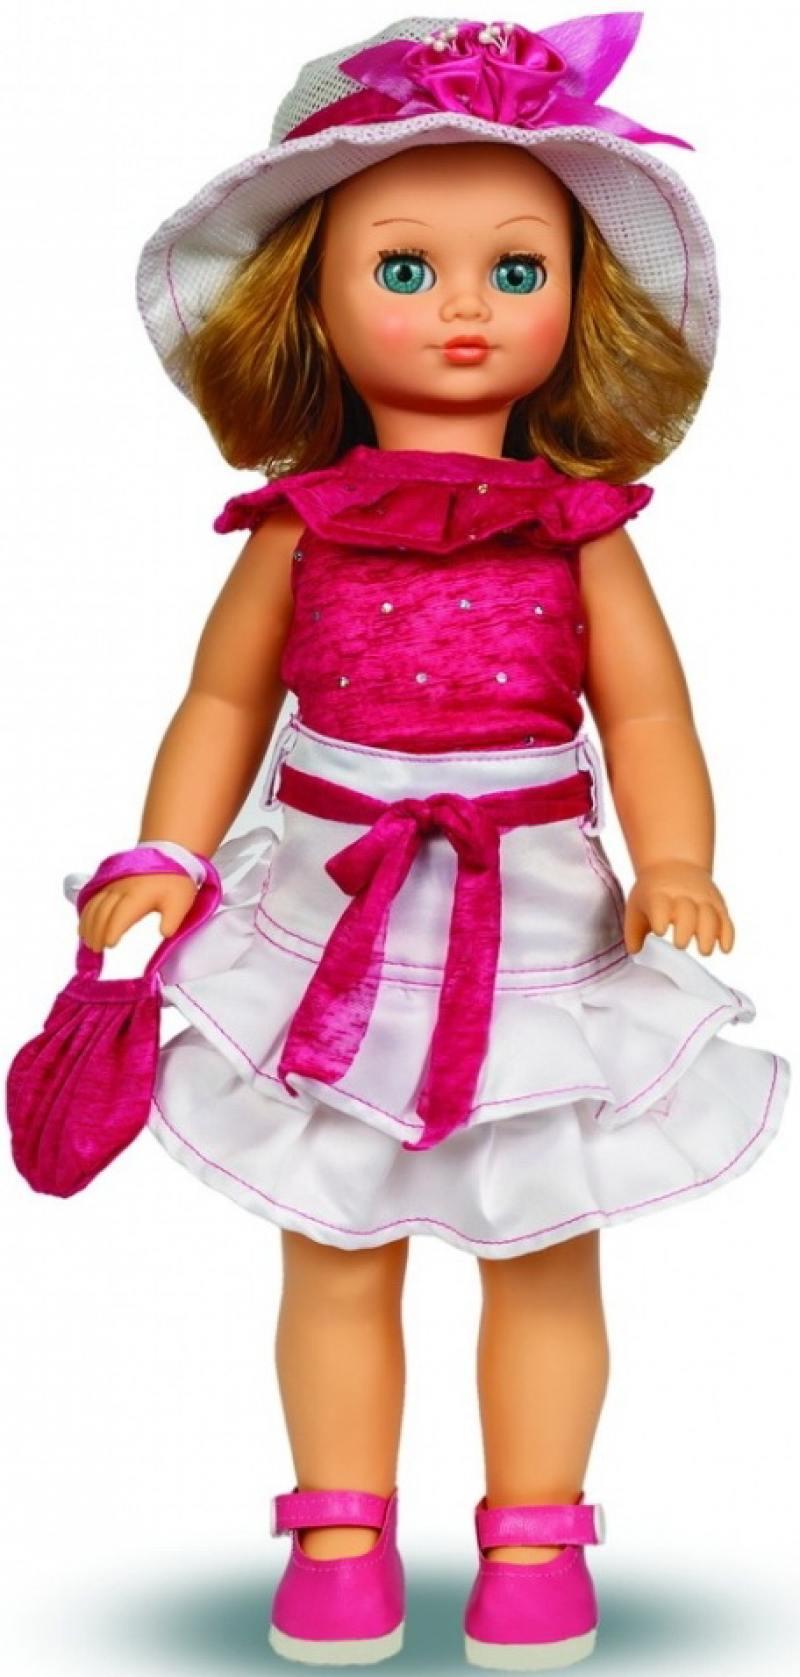 Кукла ВЕСНА Лиза 16 (озвученная) В2144/о весна кукла озвученная герда цвет платья желтый синий